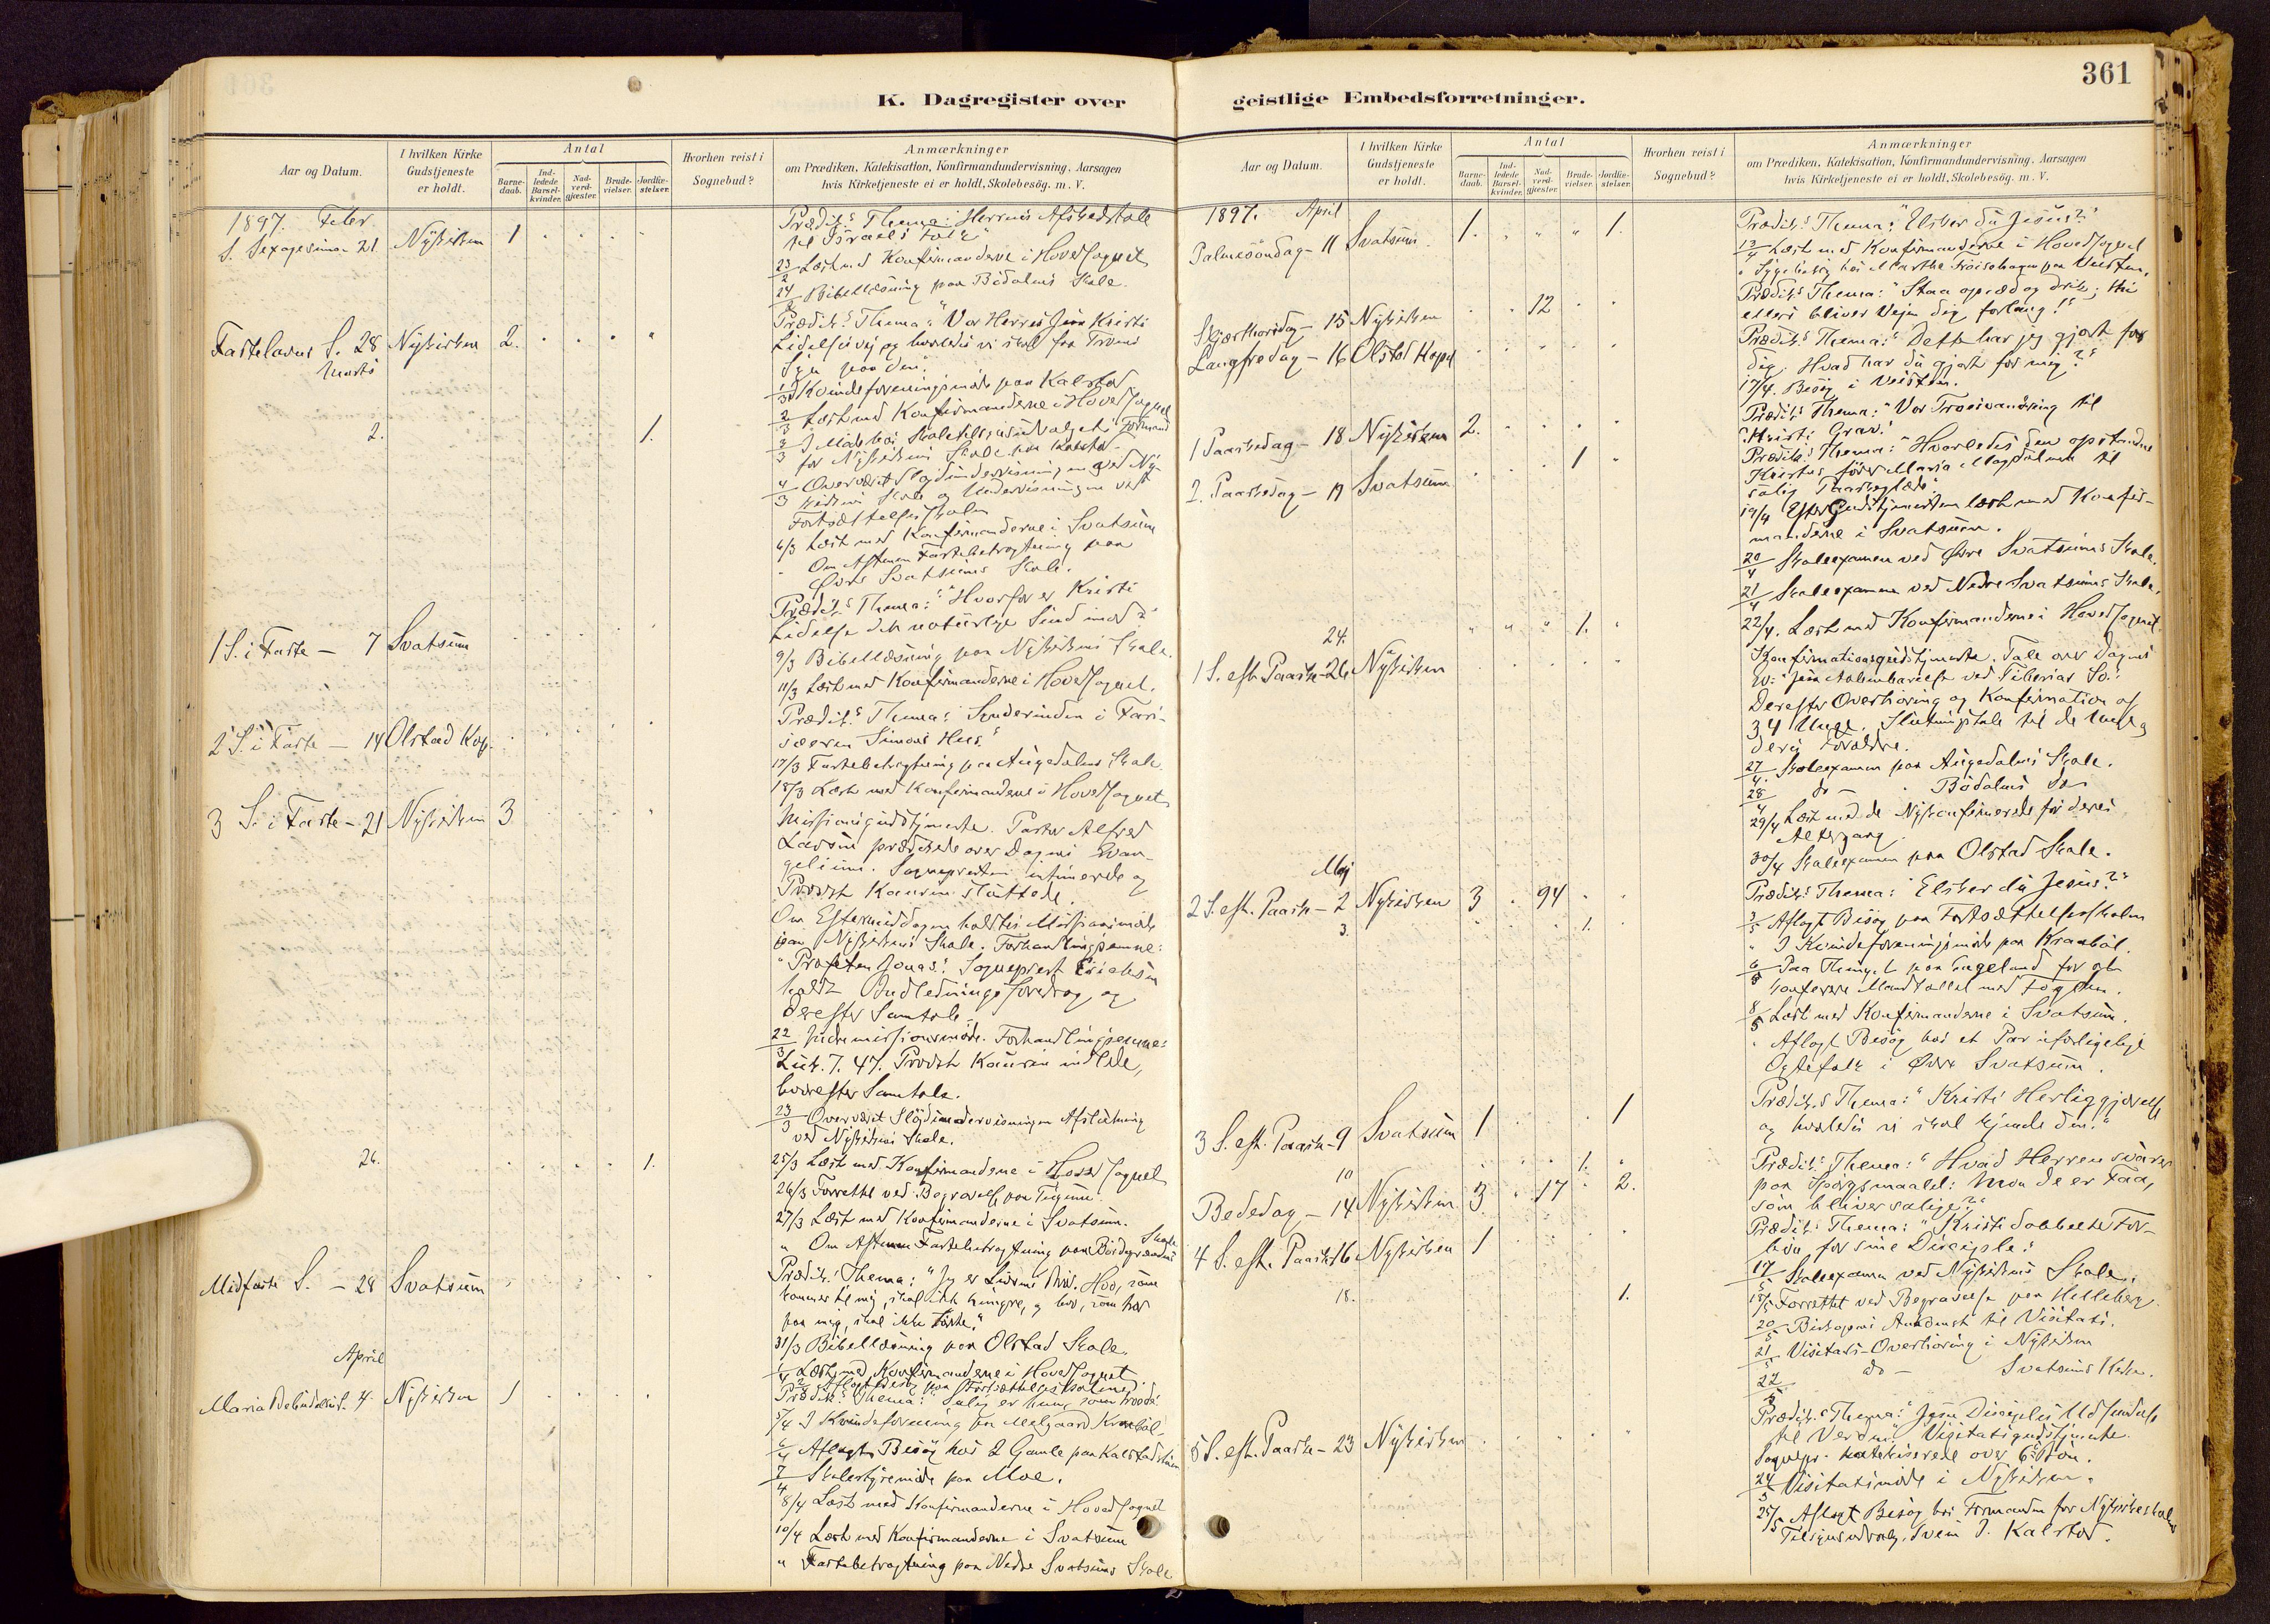 SAH, Vestre Gausdal prestekontor, Ministerialbok nr. 1, 1887-1914, s. 361